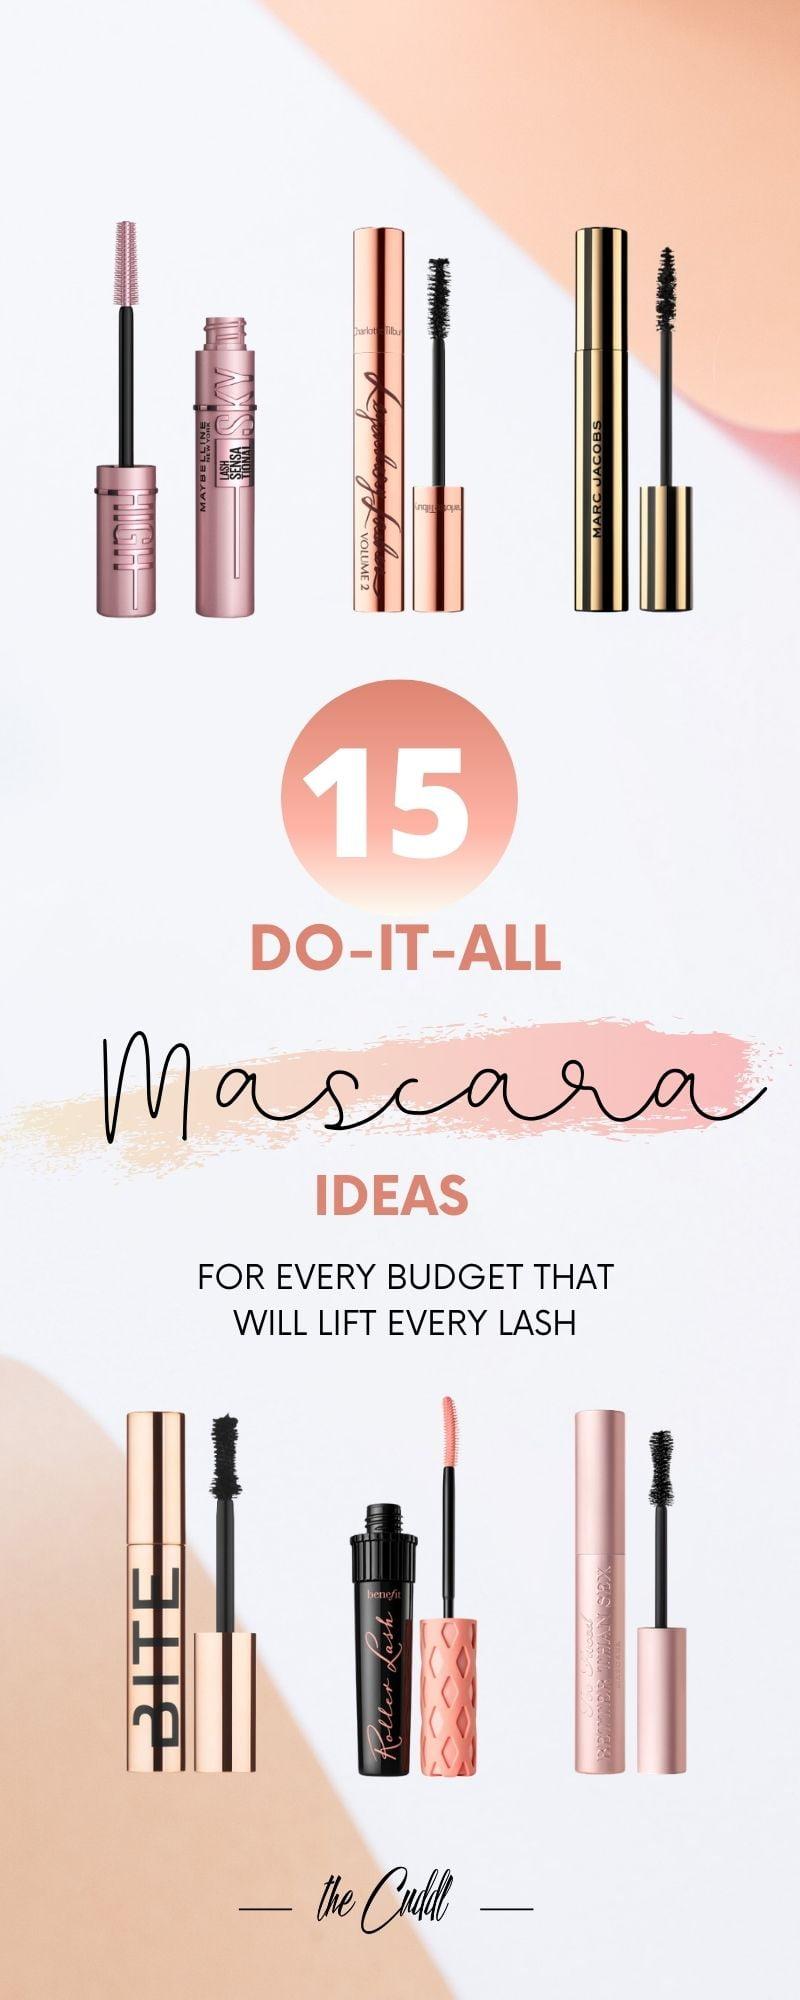 Best Mascara